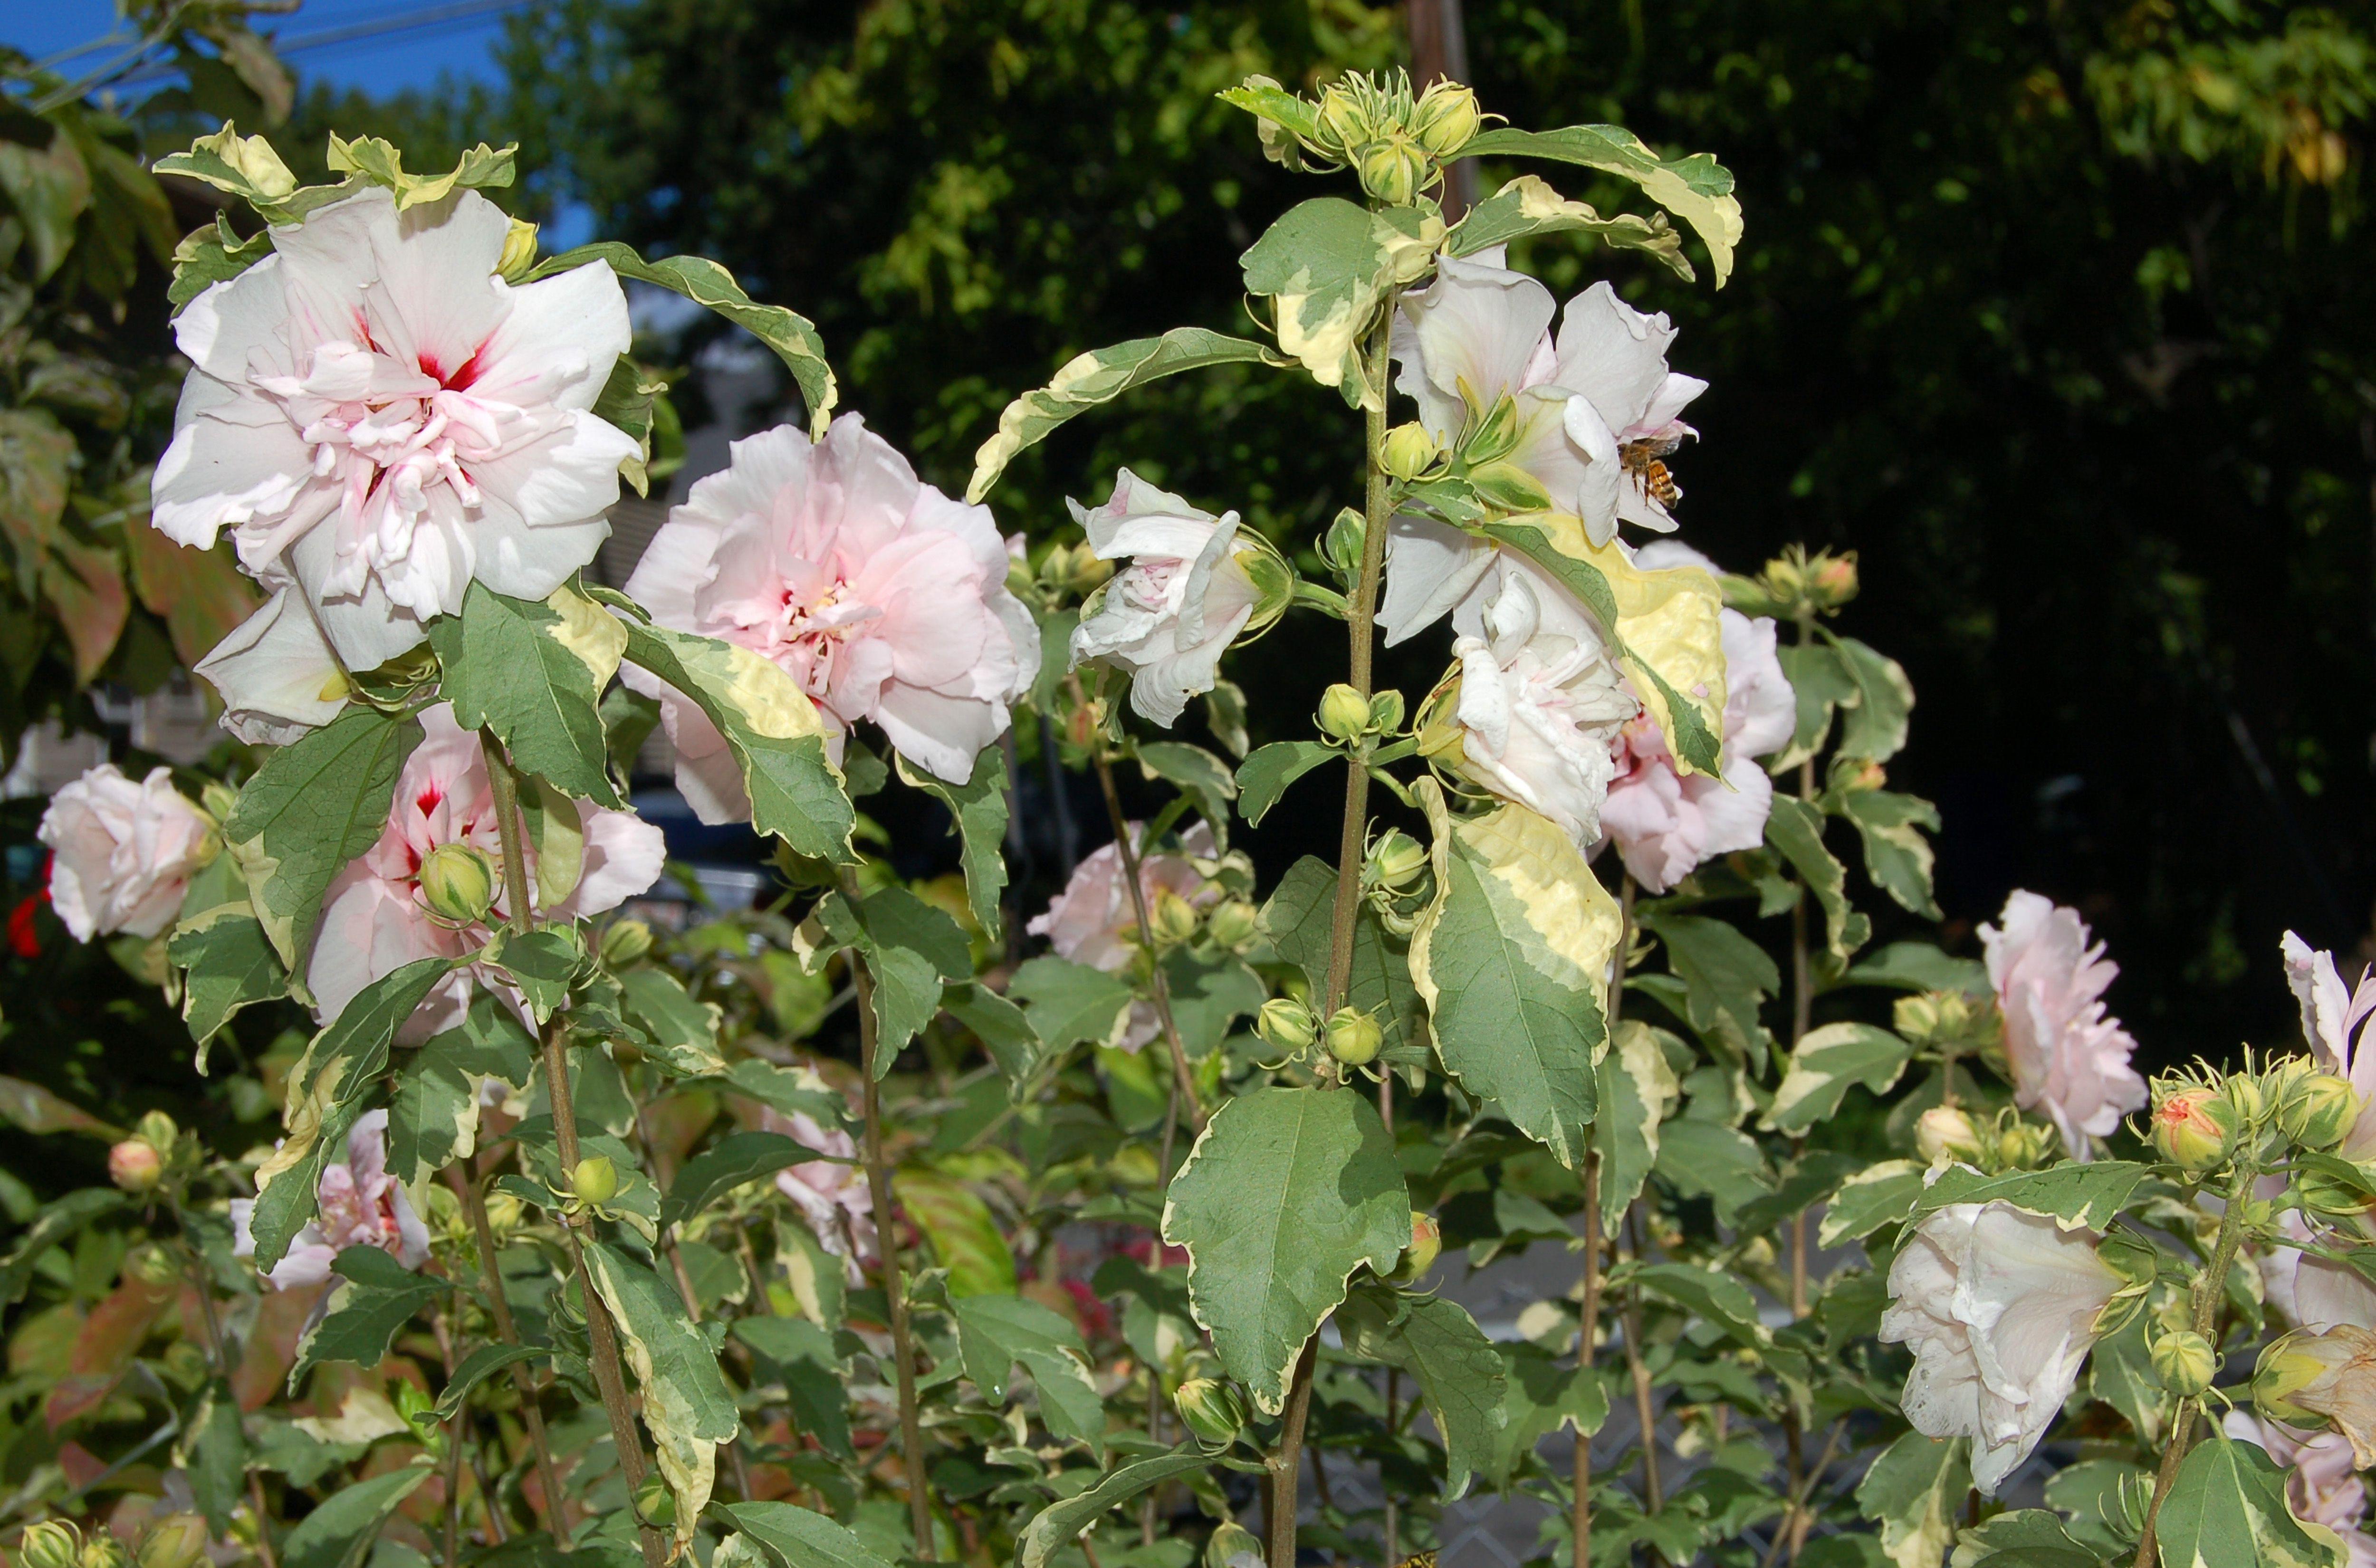 Sugar Tip rose of Sharon blooms big 57bb1eb95f9b58cdfde452a4